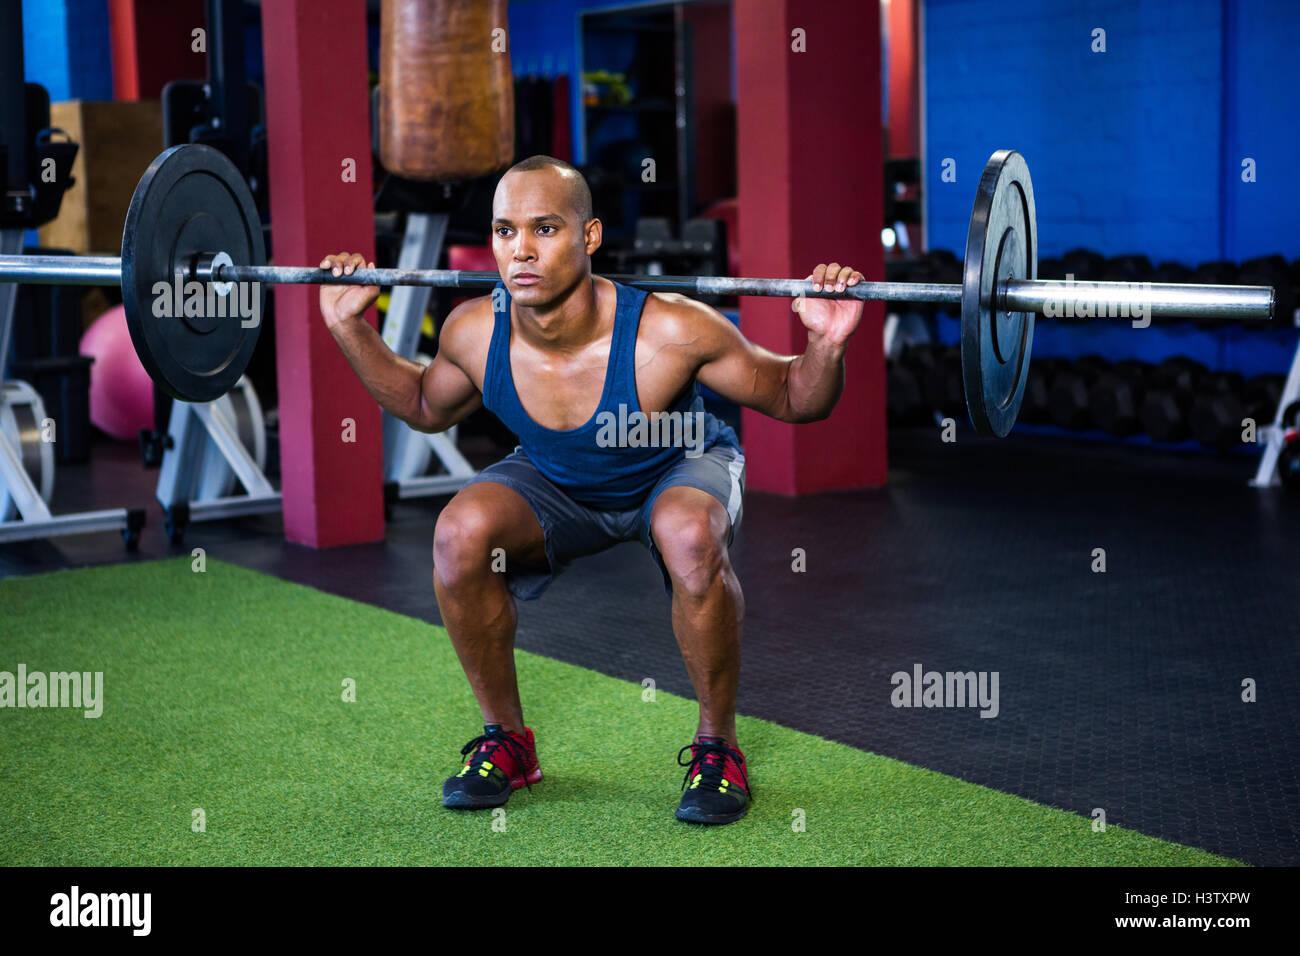 Jeune homme haltérophilie in fitness studio Photo Stock